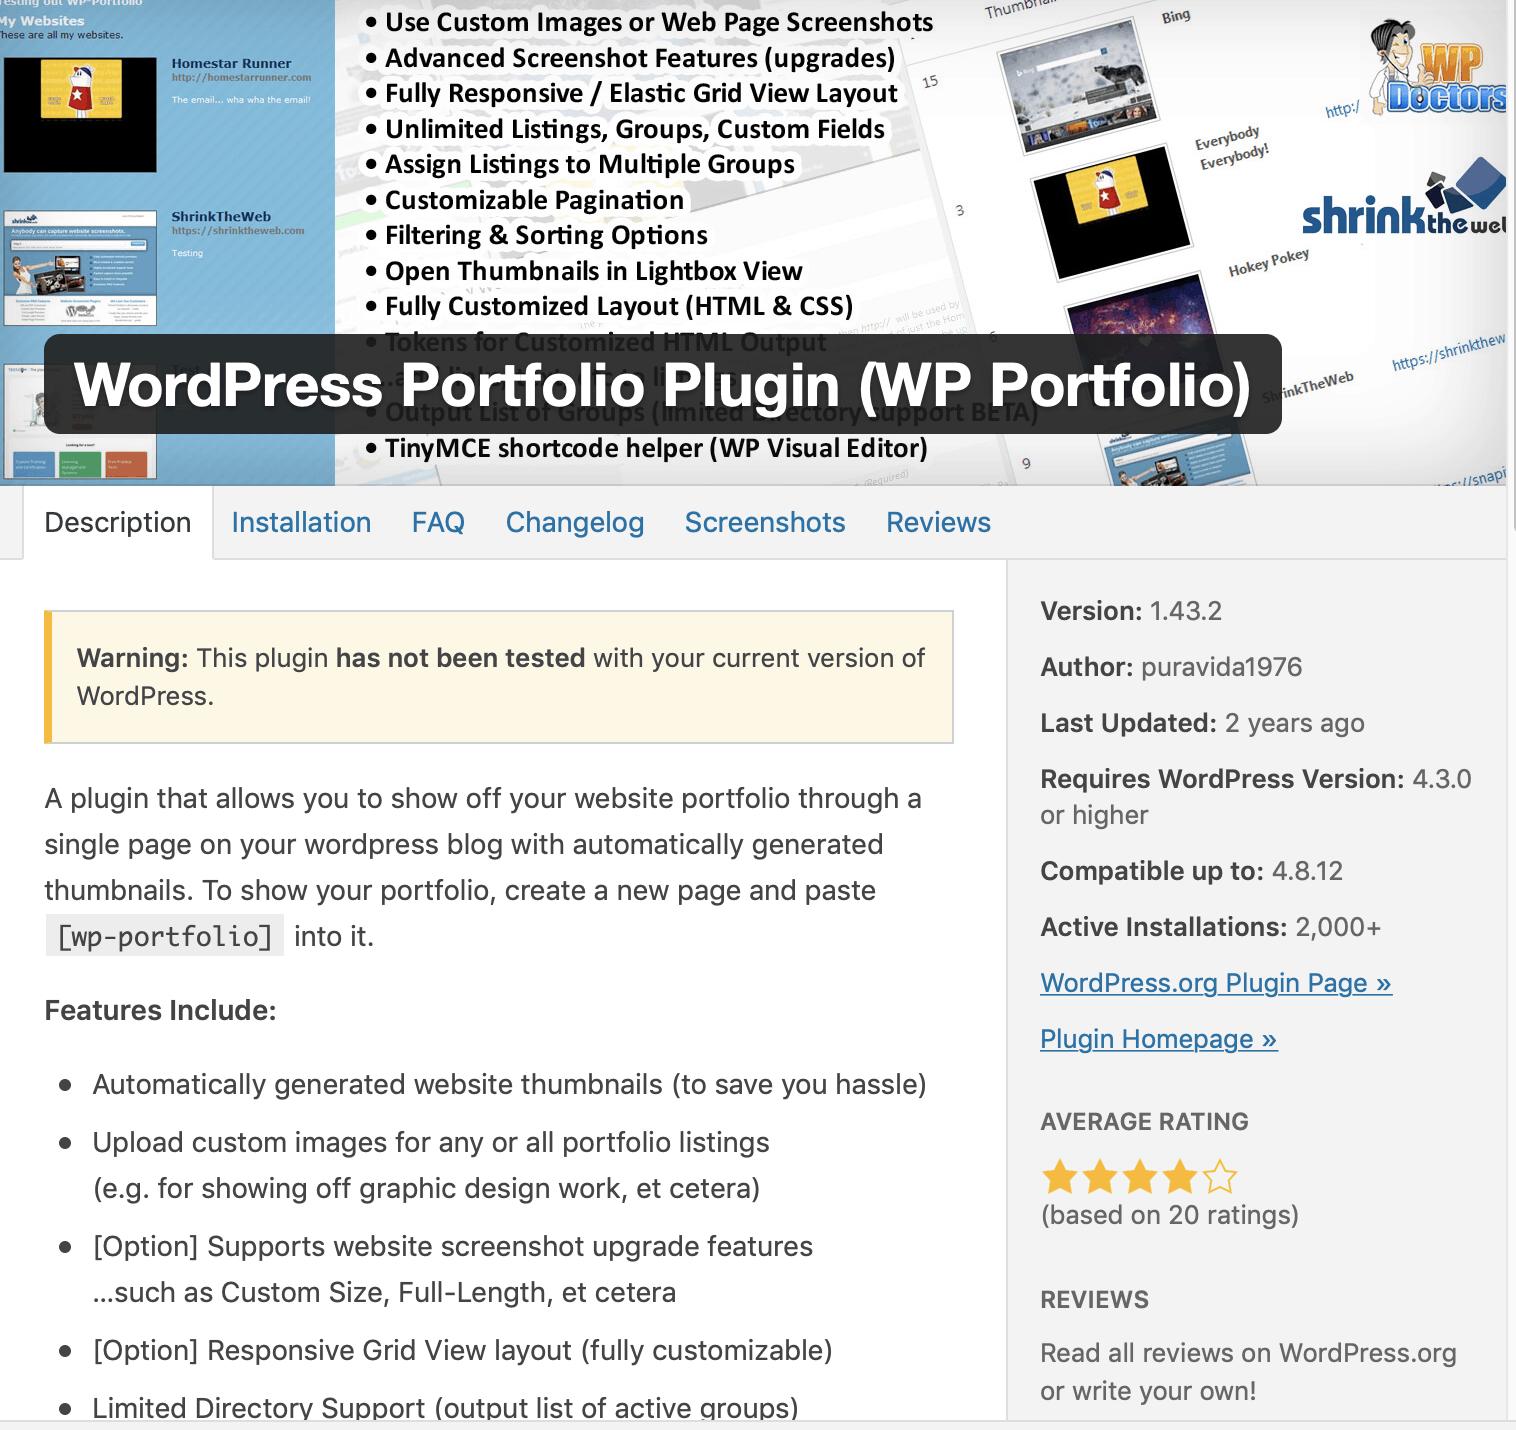 wp portfolio